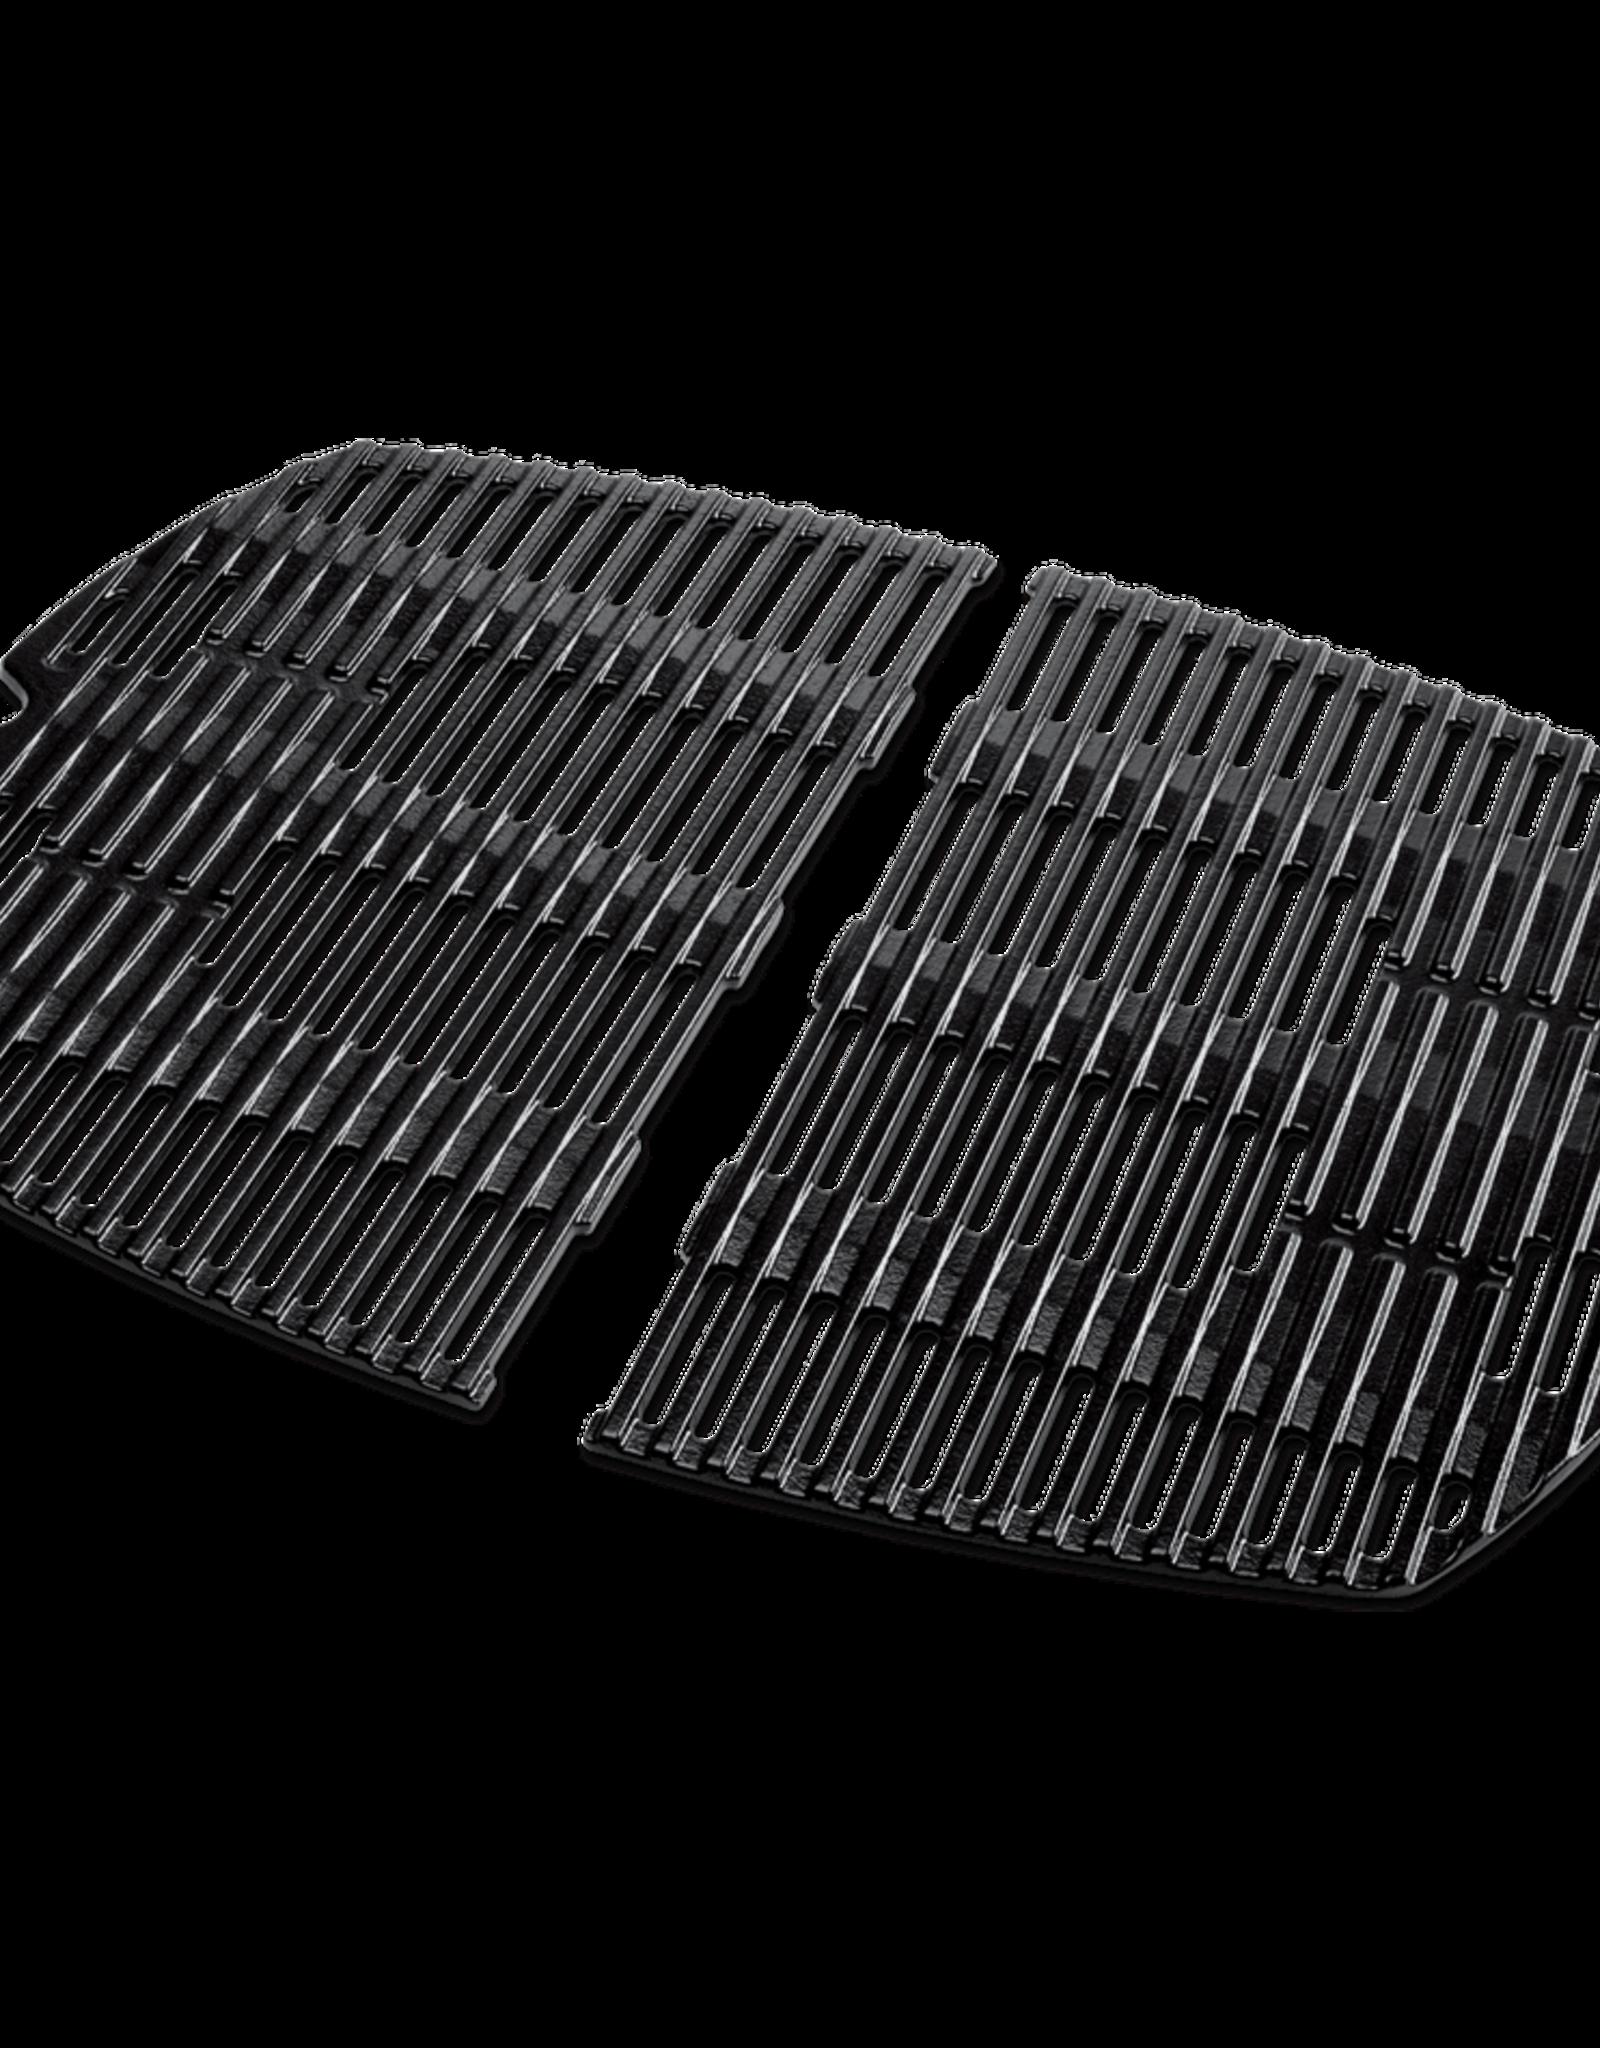 Weber Cooking Grates - Fits Weber Q 300/3000 series